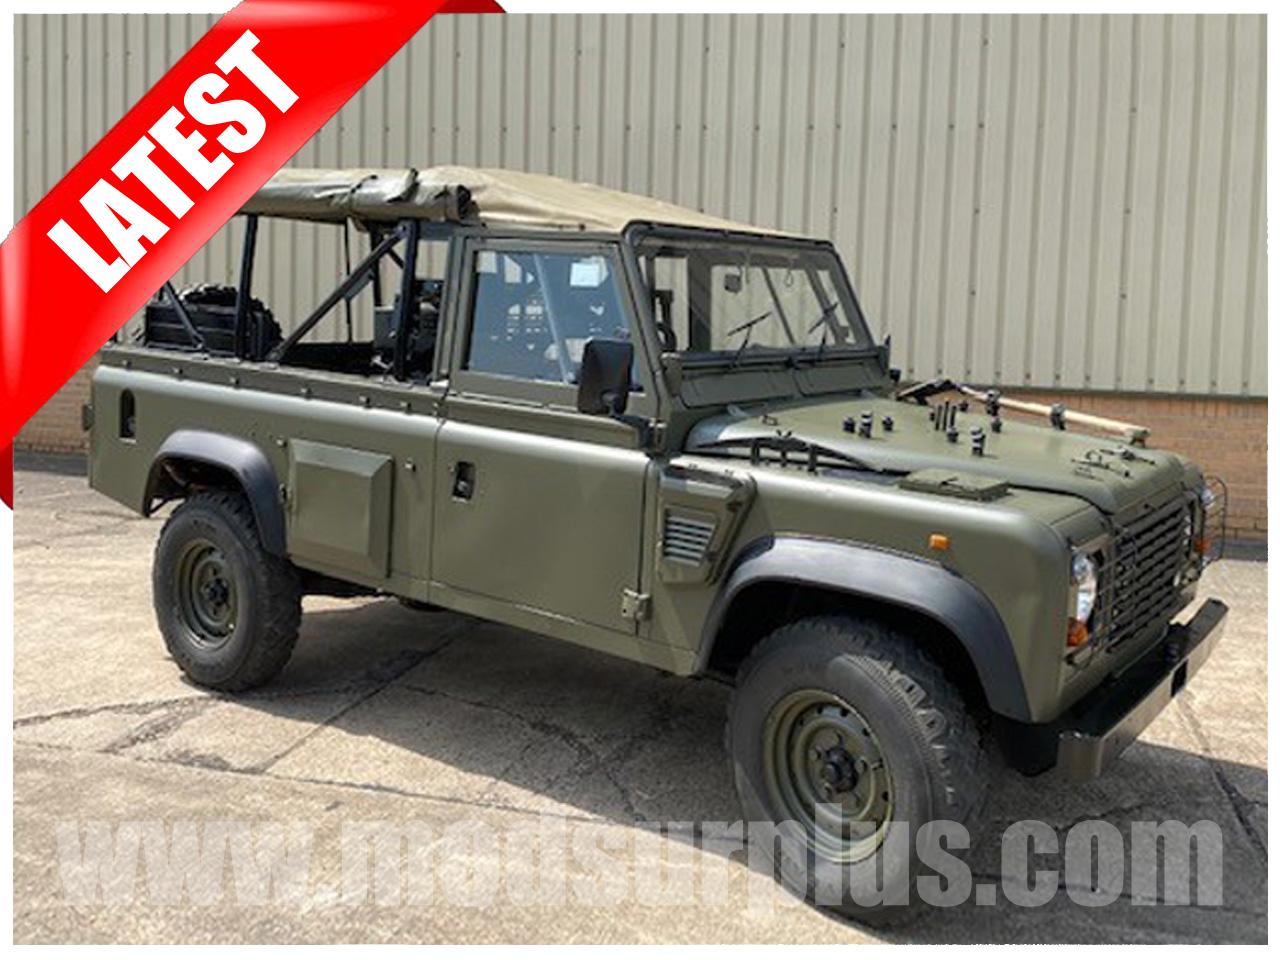 modsurplus - ex military vehicle - Land Rover Defender 110 Wolf RHD Soft Top (Remus) - MoD Ref: 50389